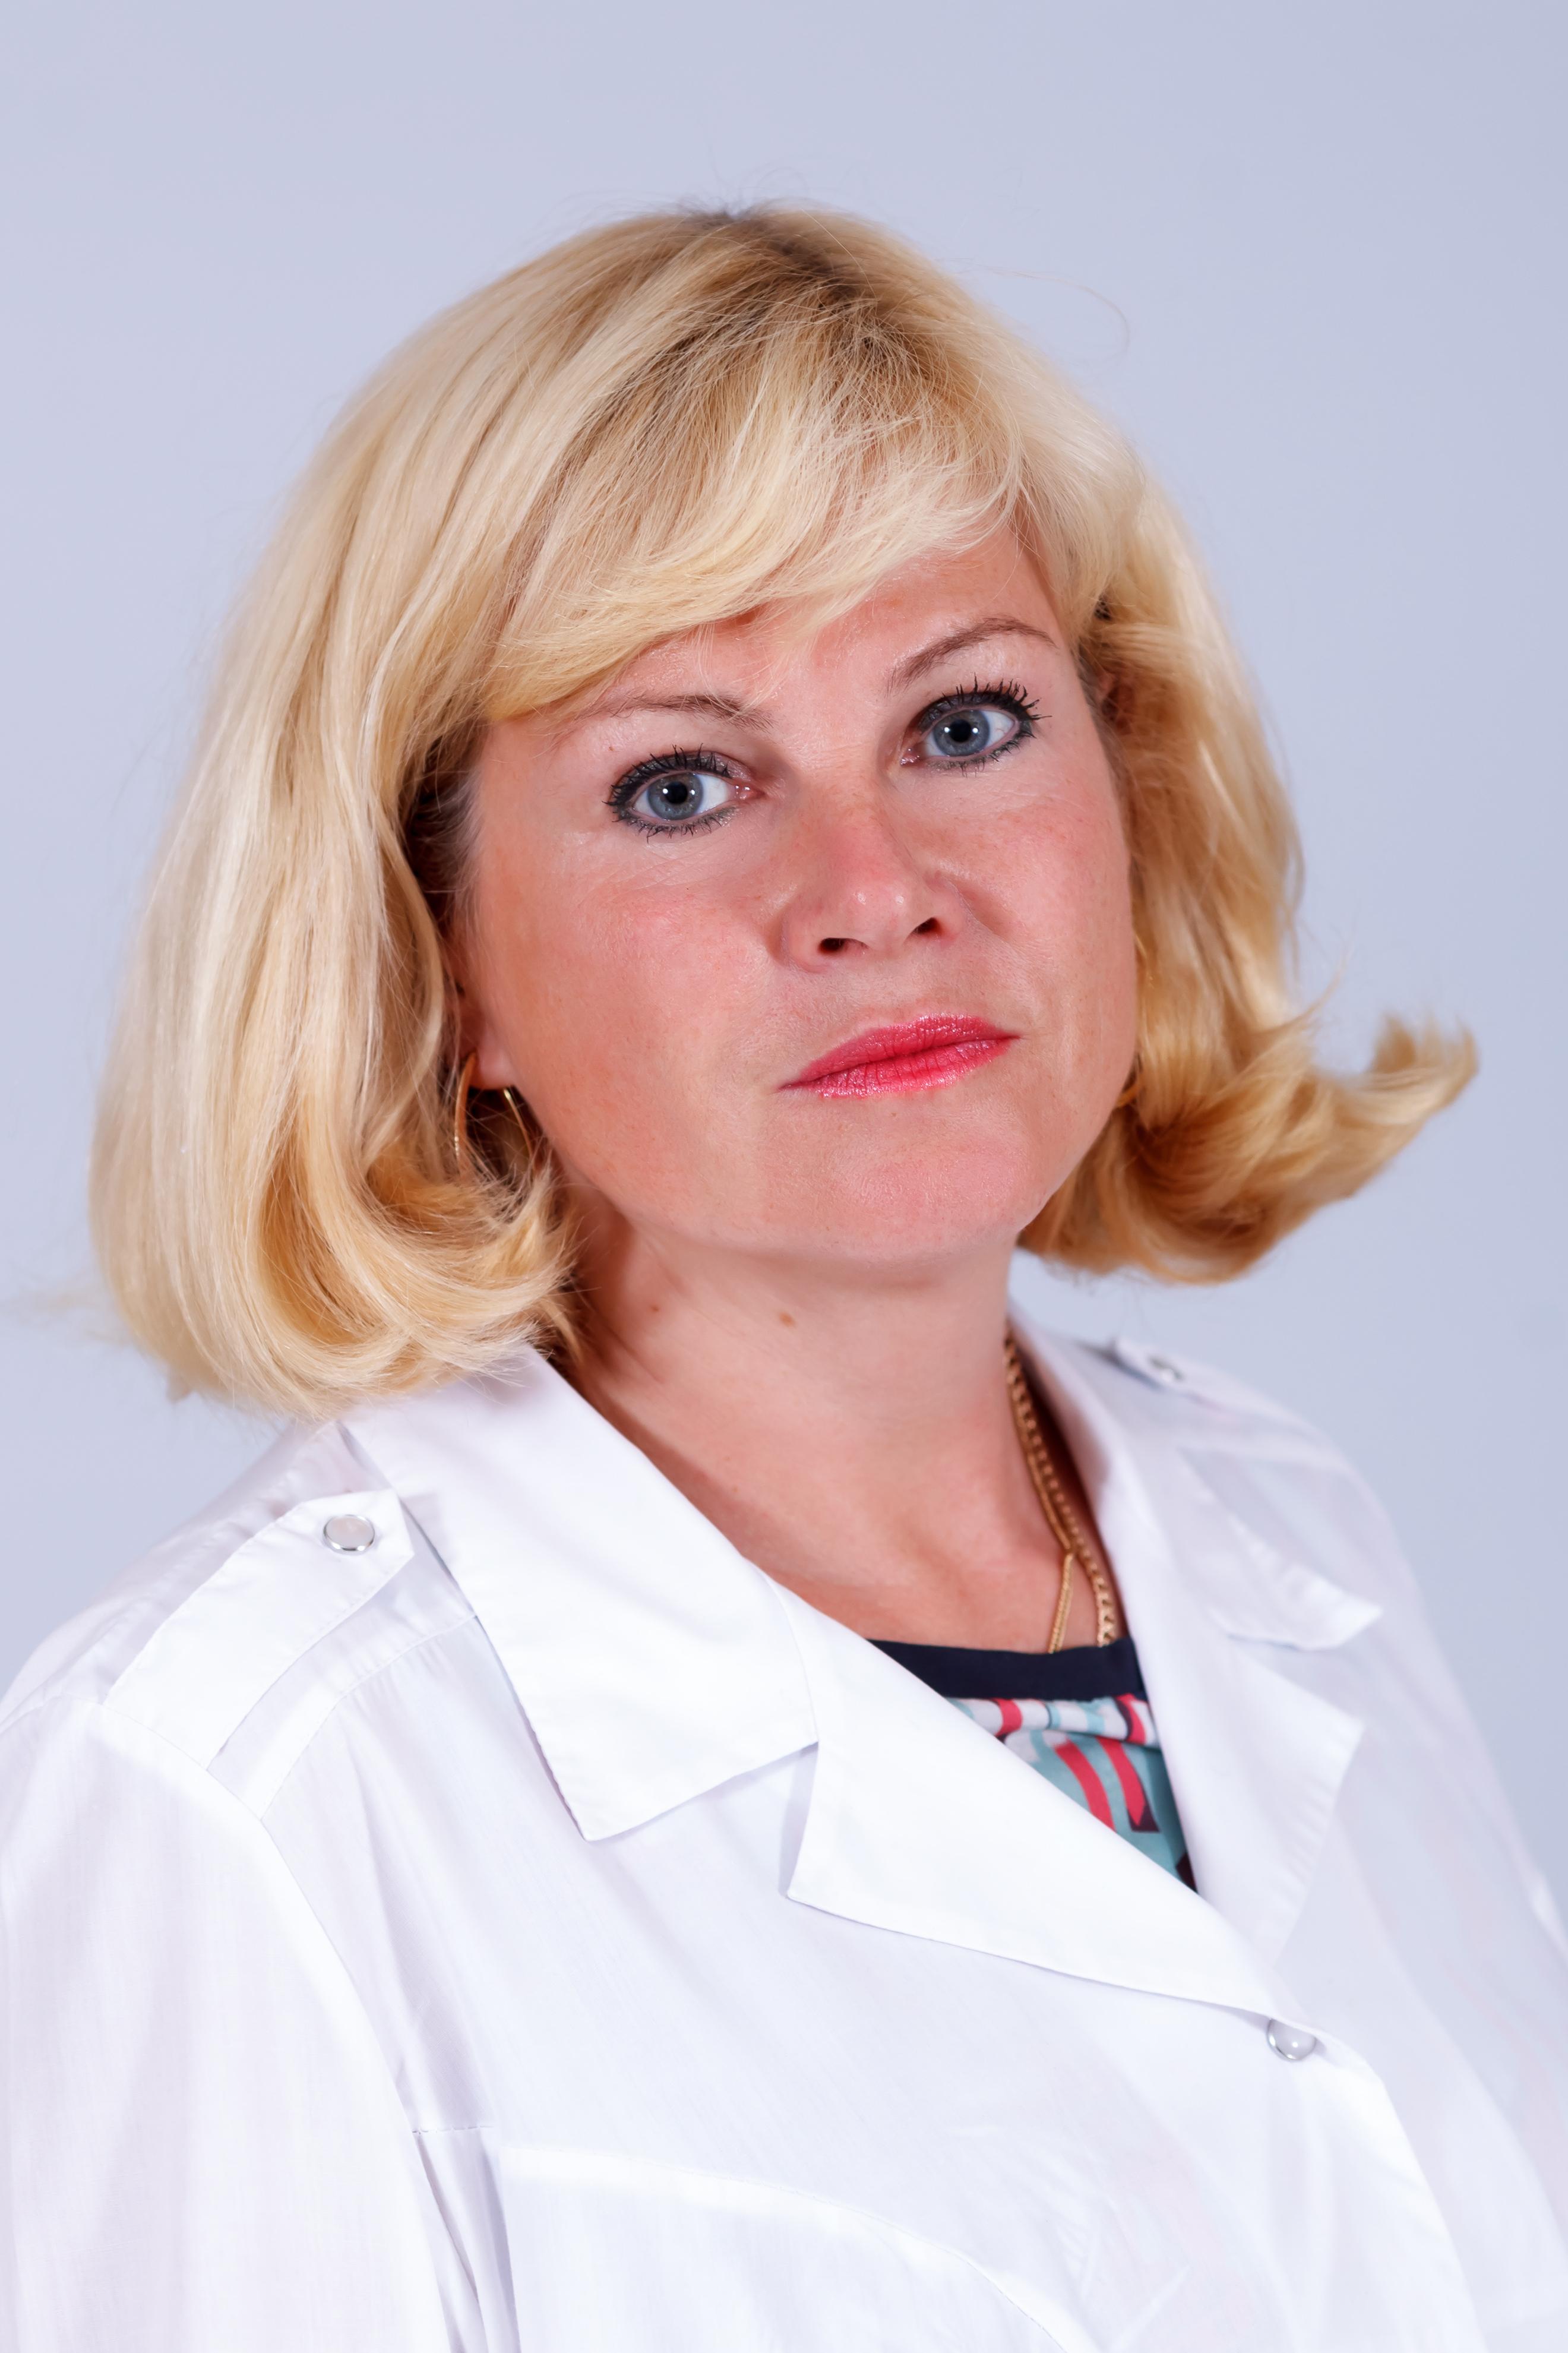 Елисеева Марина Владимировна